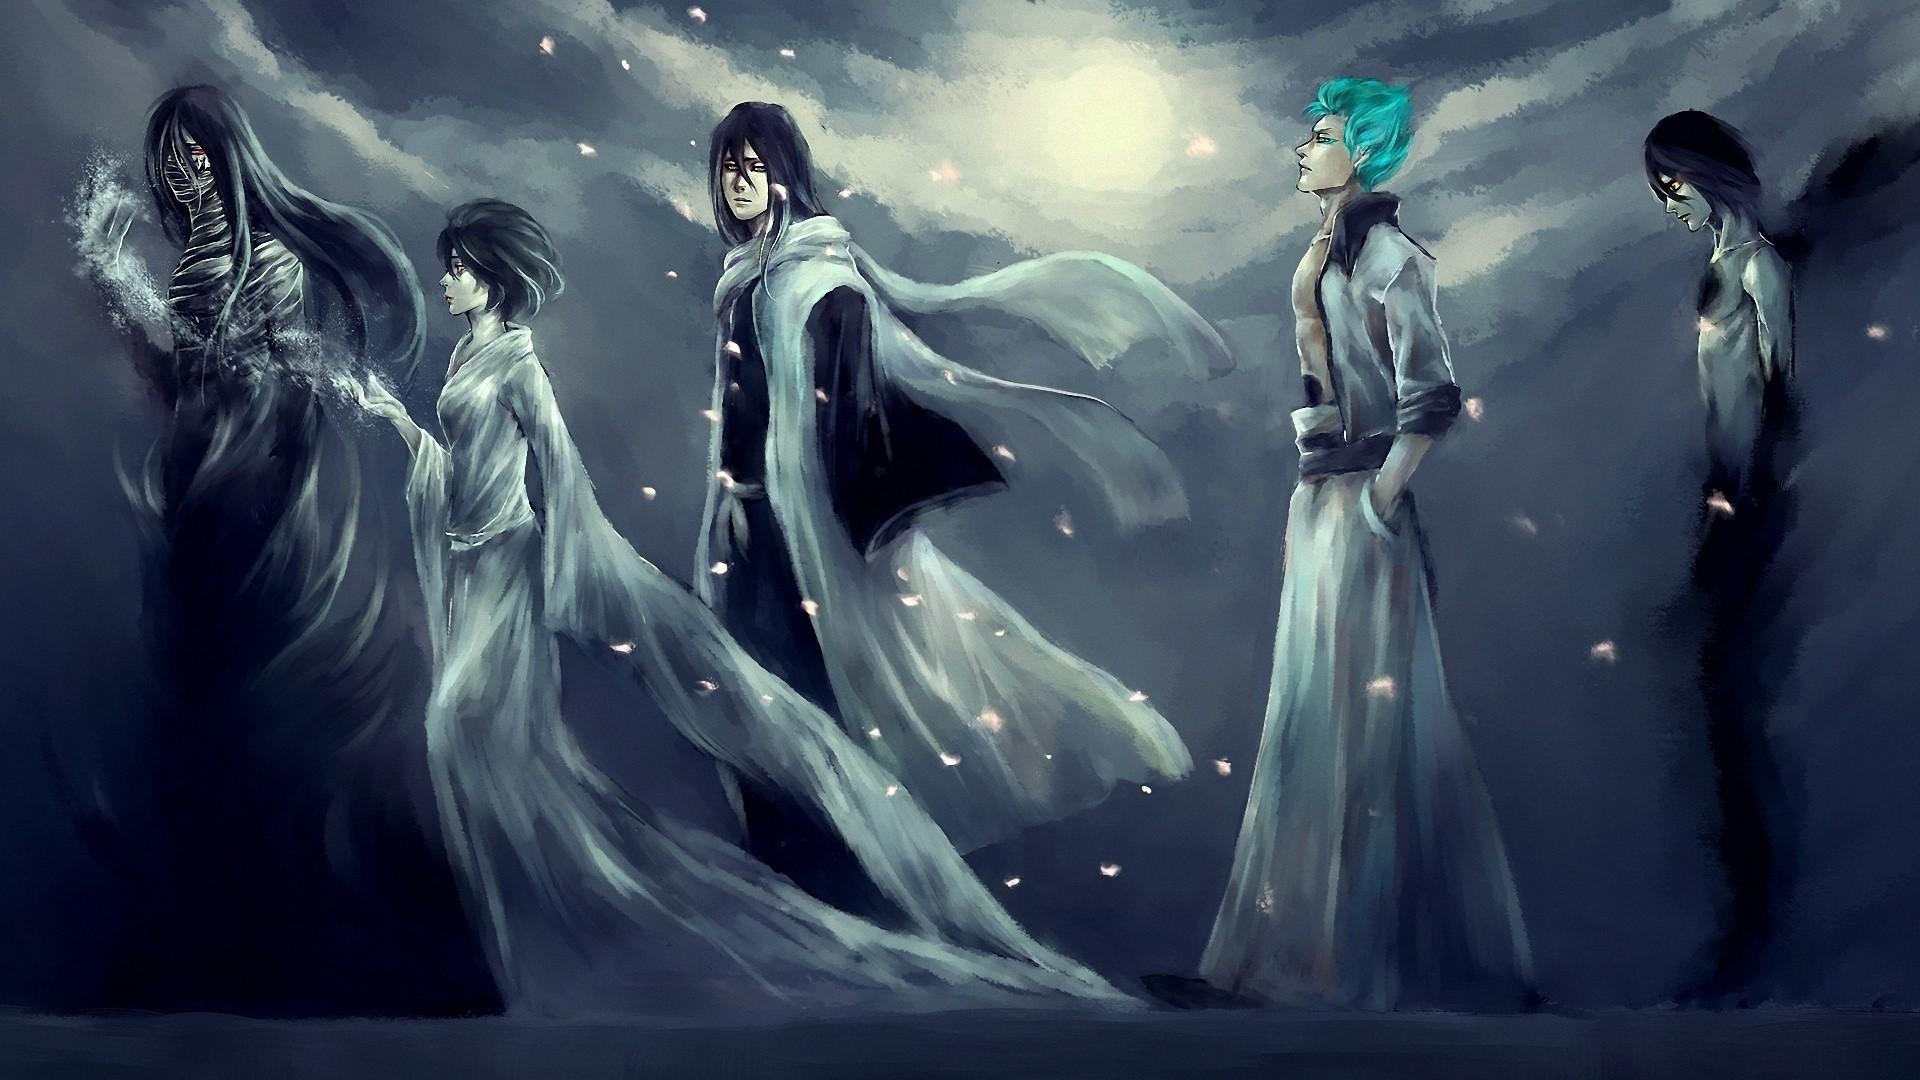 Dark anime wallpaper download free awesome high - Wallpaper dark anime ...